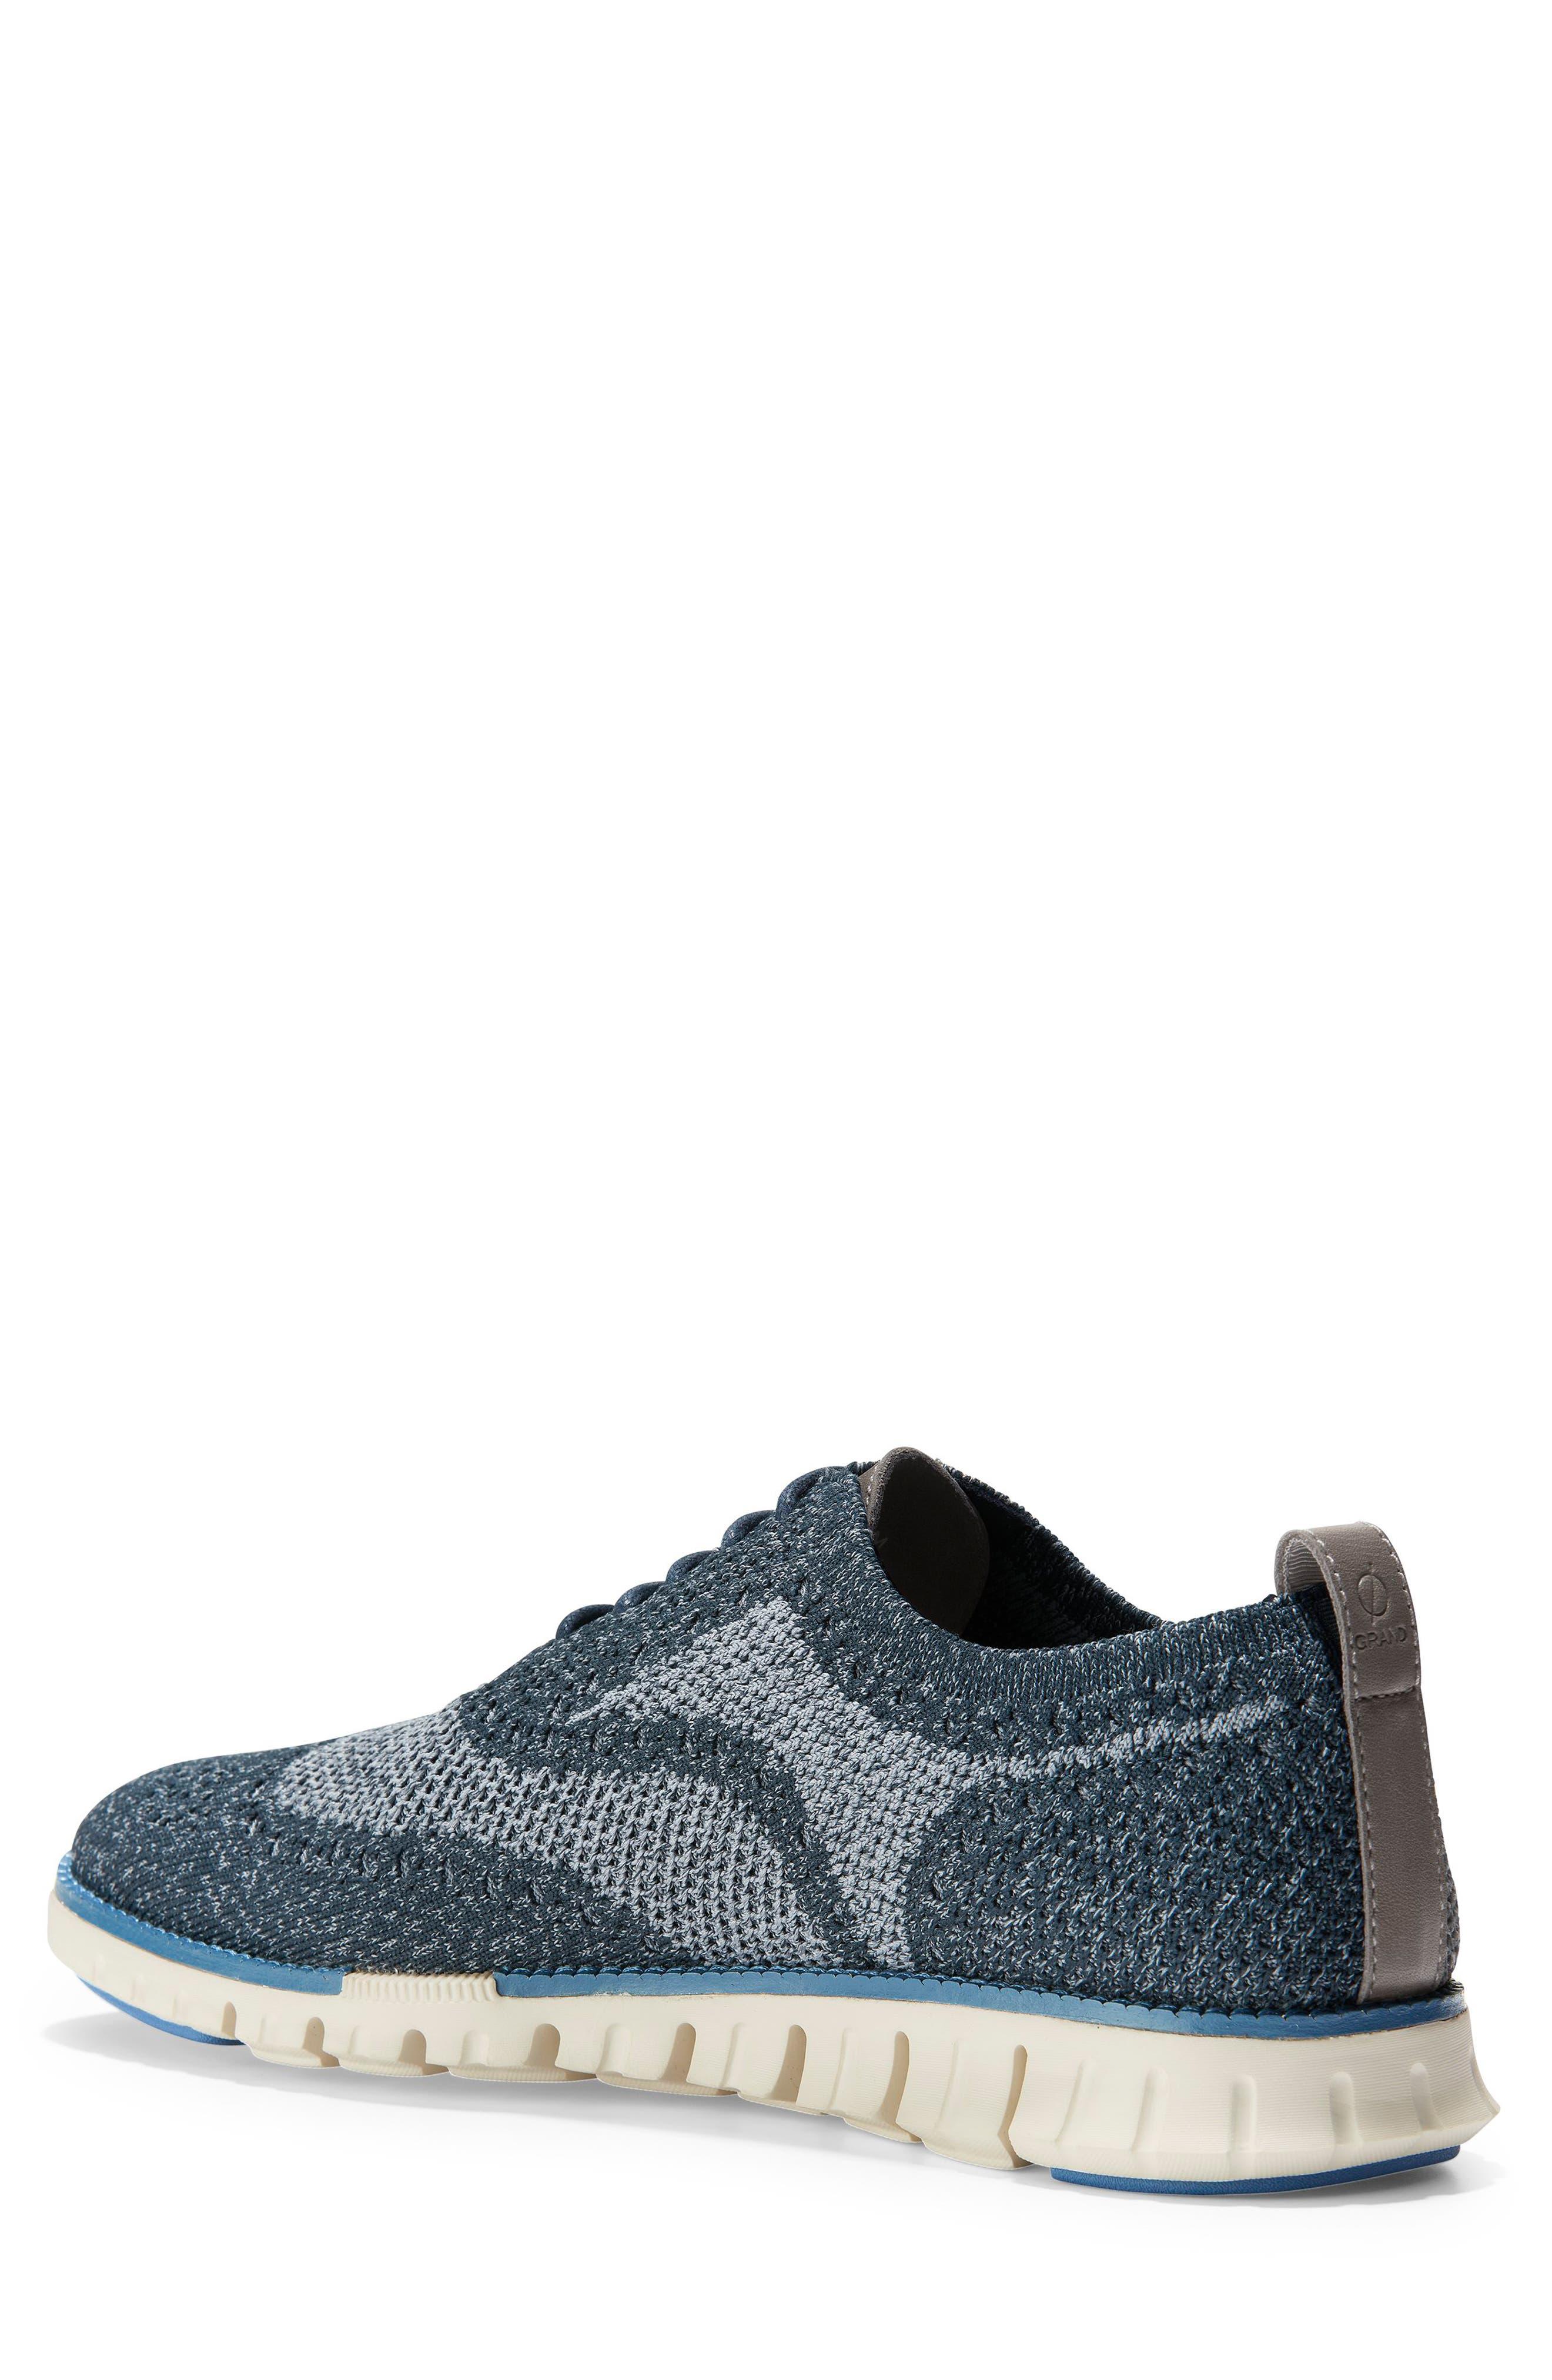 ZeroGrand Stitchlite Woven Wool Wingtip,                             Alternate thumbnail 2, color,                             BLUEBERRY KNIT